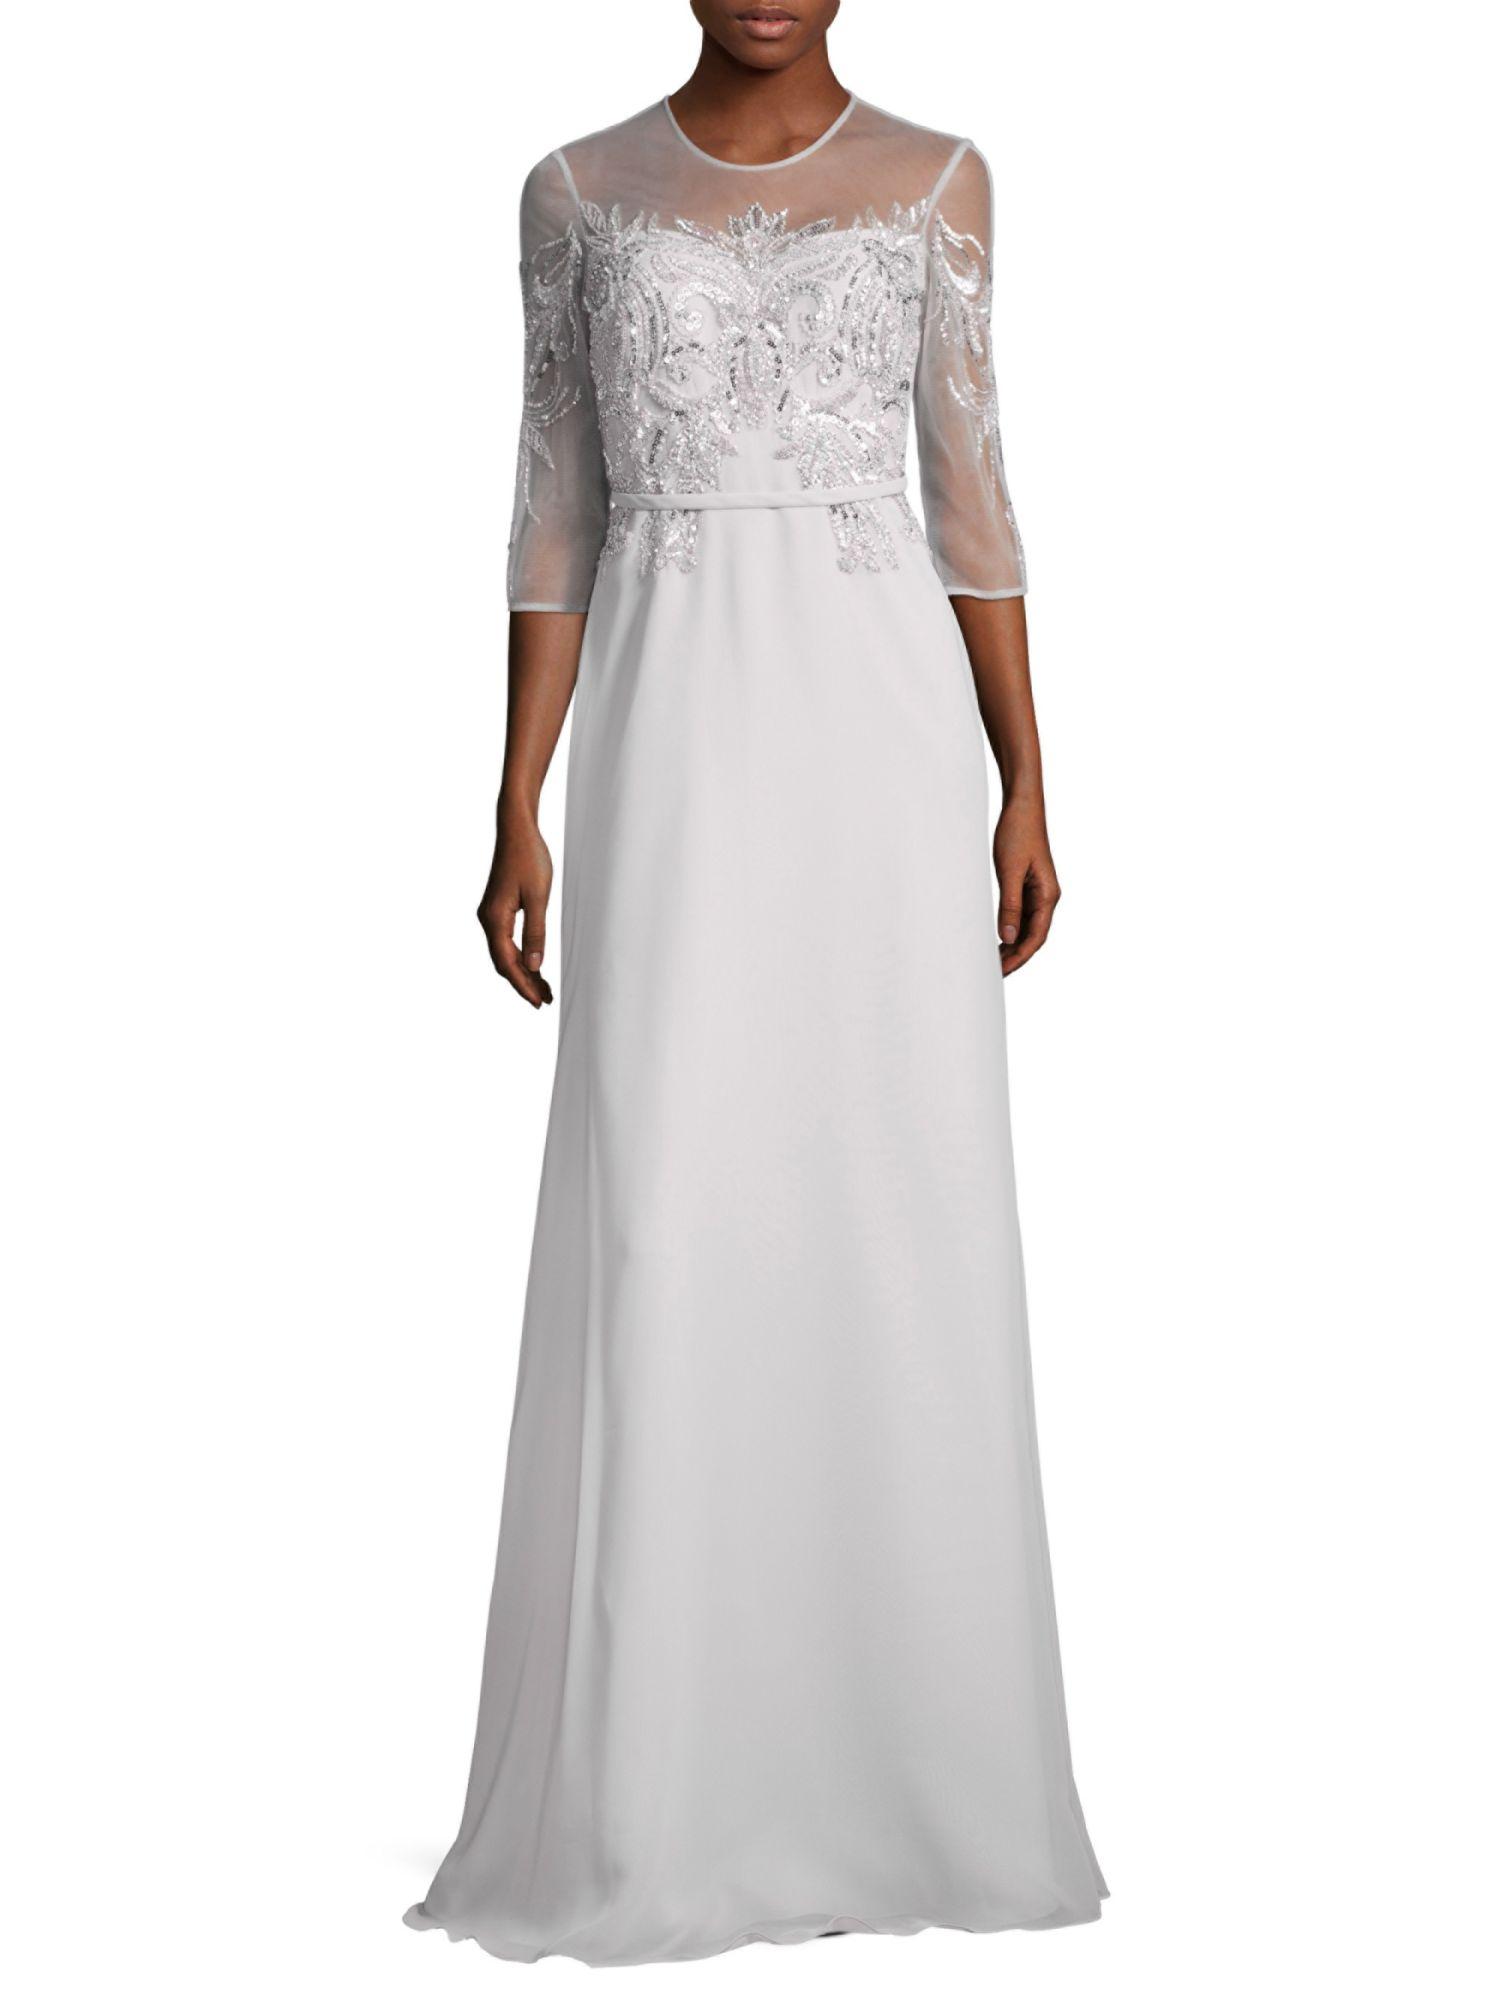 1e64e77245 Basix Black Label 3 4 Sleeve Beaded Illusion Evening Gown Dress Silver 6